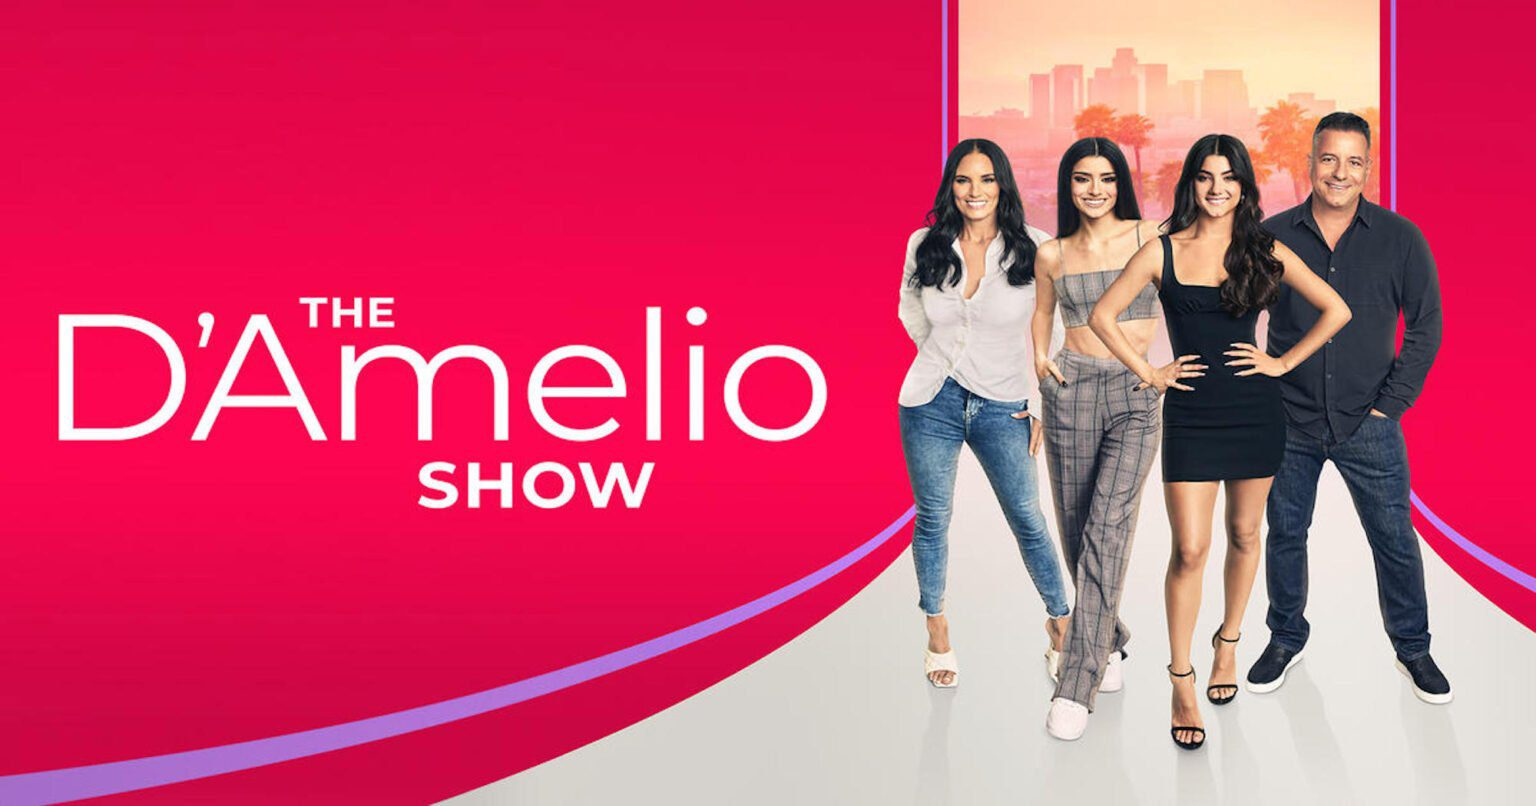 !5 best shows